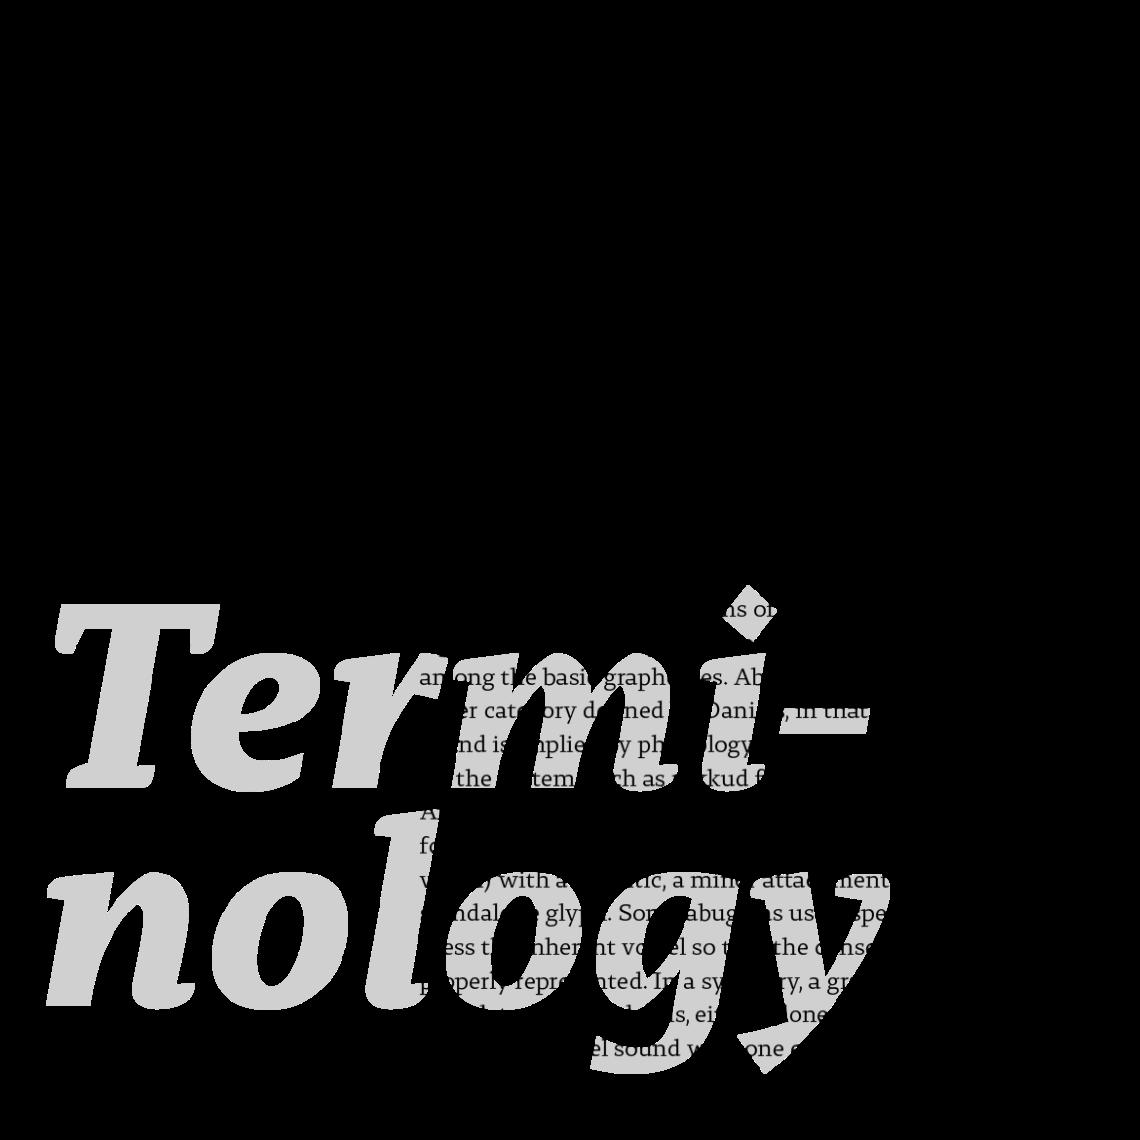 29LT-Zarid-Text-Image-23